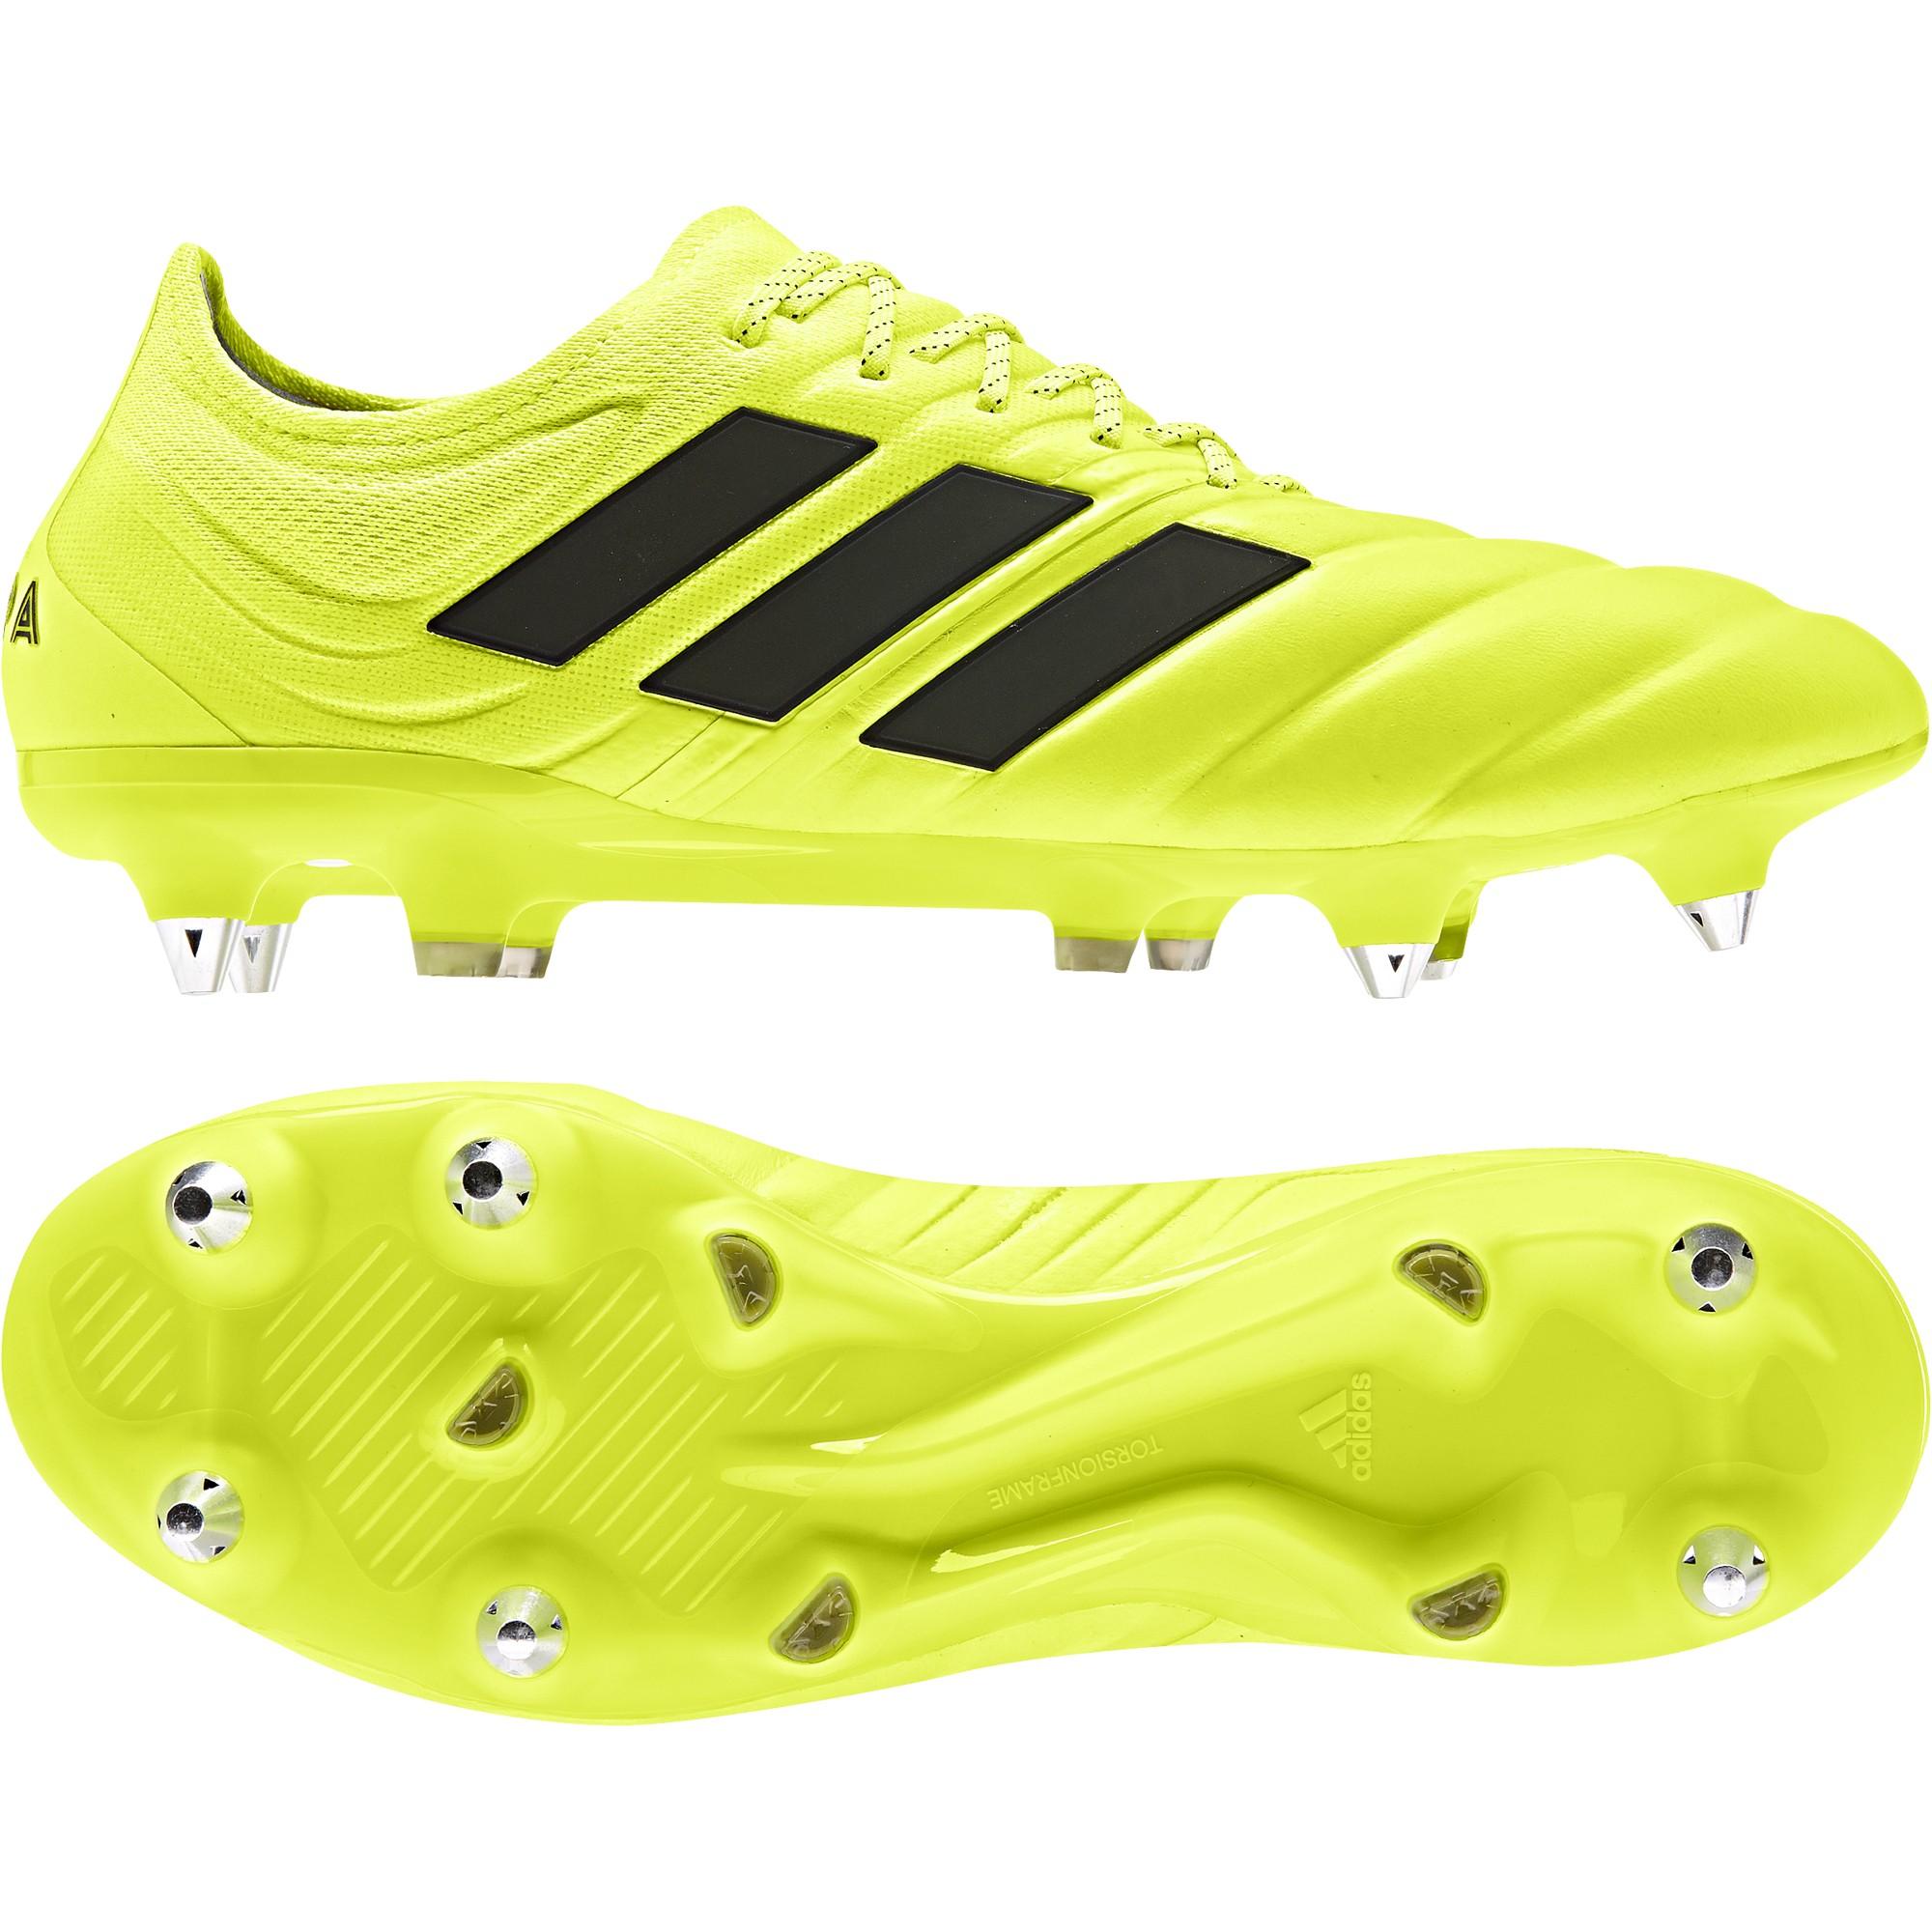 calcio ADIDAS scarpe da calcio copa 19.1 sg giallo nero uomo g26643